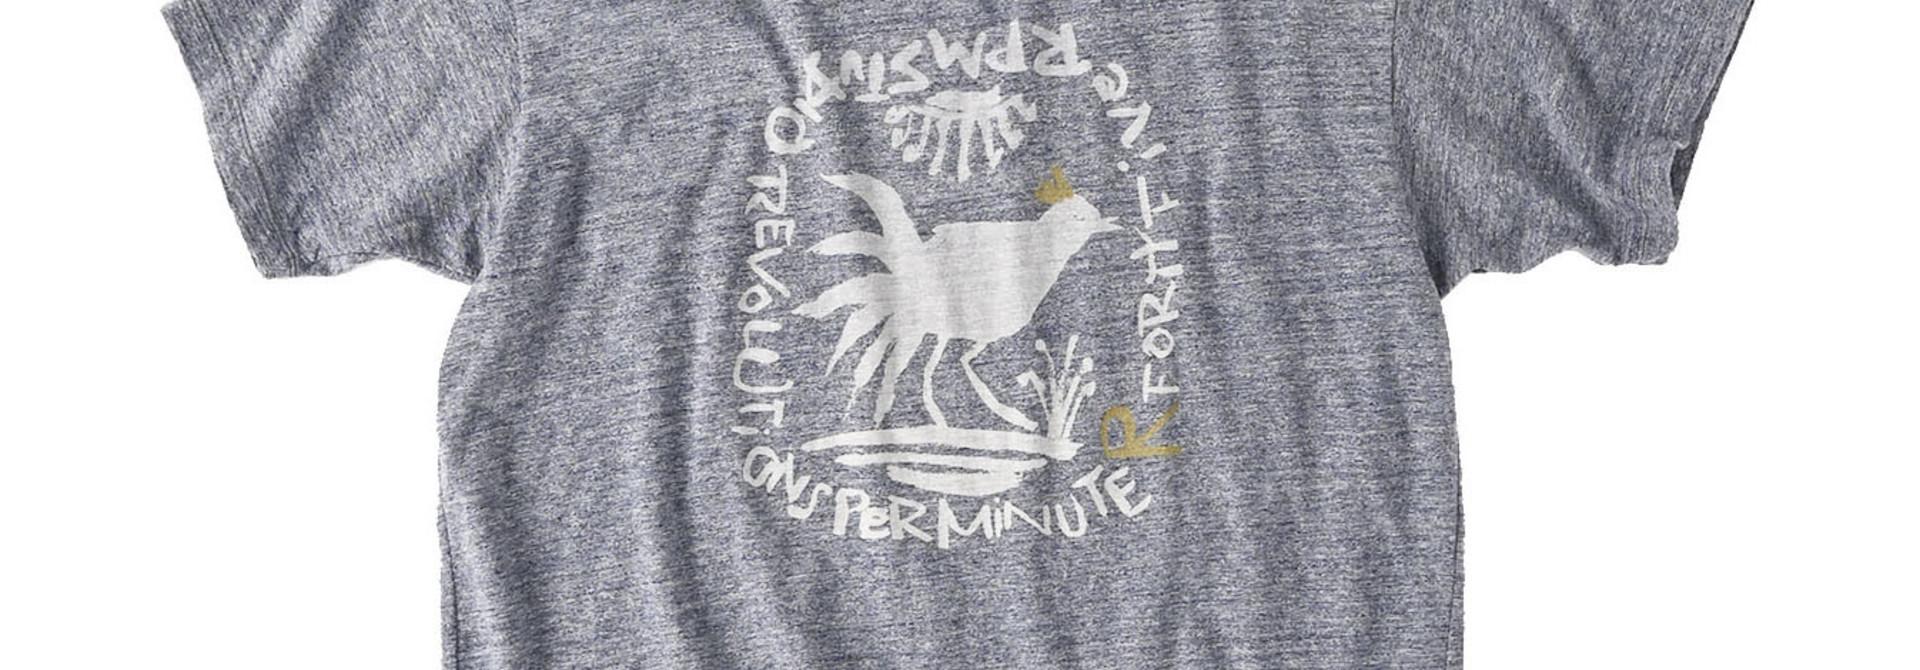 Top Sumite de Chicken T-shirt